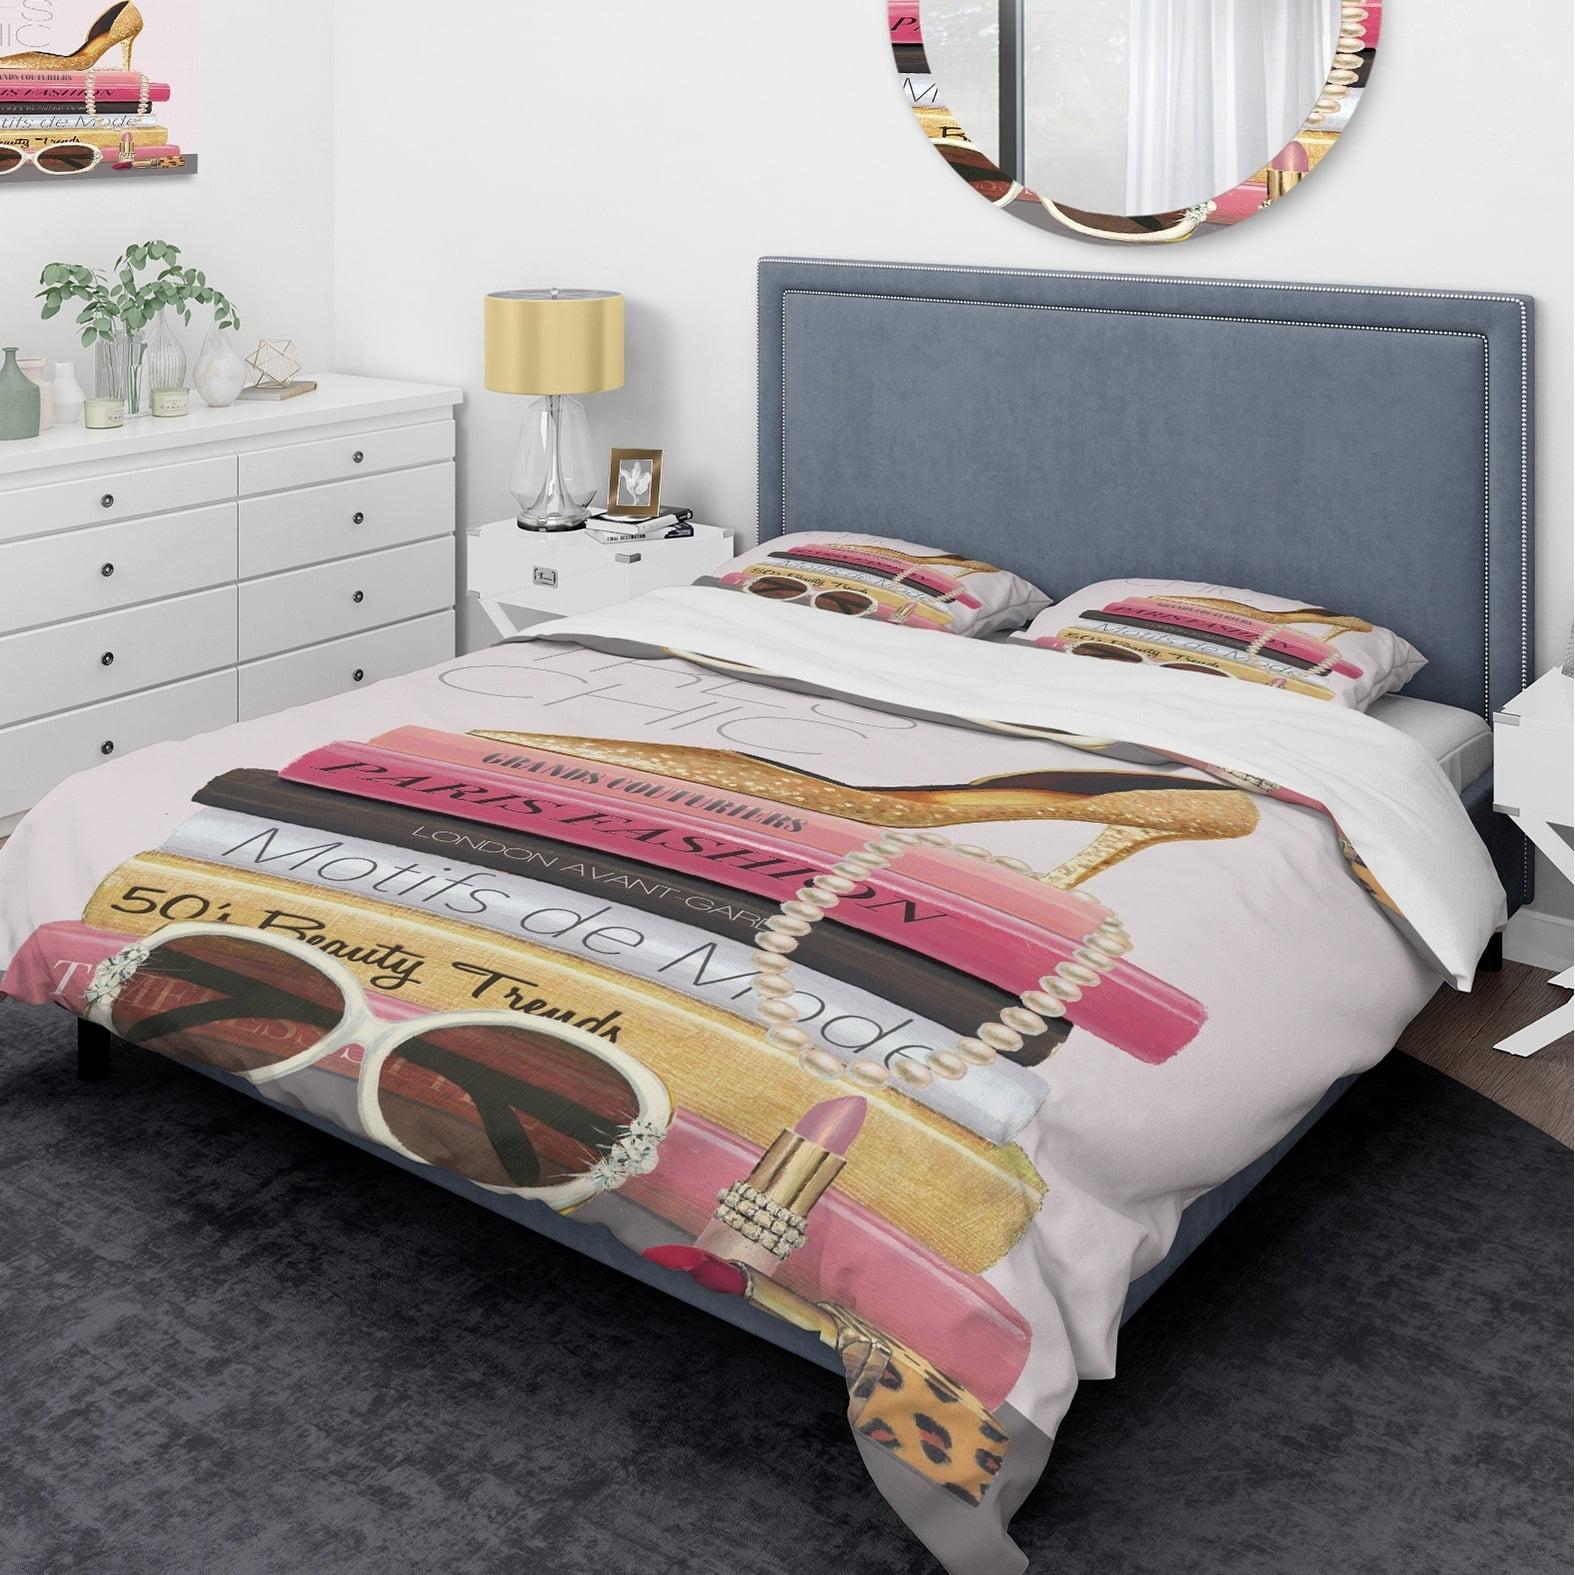 DESIGN ART Designart 'Paris Style II Gold and Black Tres Chic' Glam Bedding Set - Duvet Cover & Shams